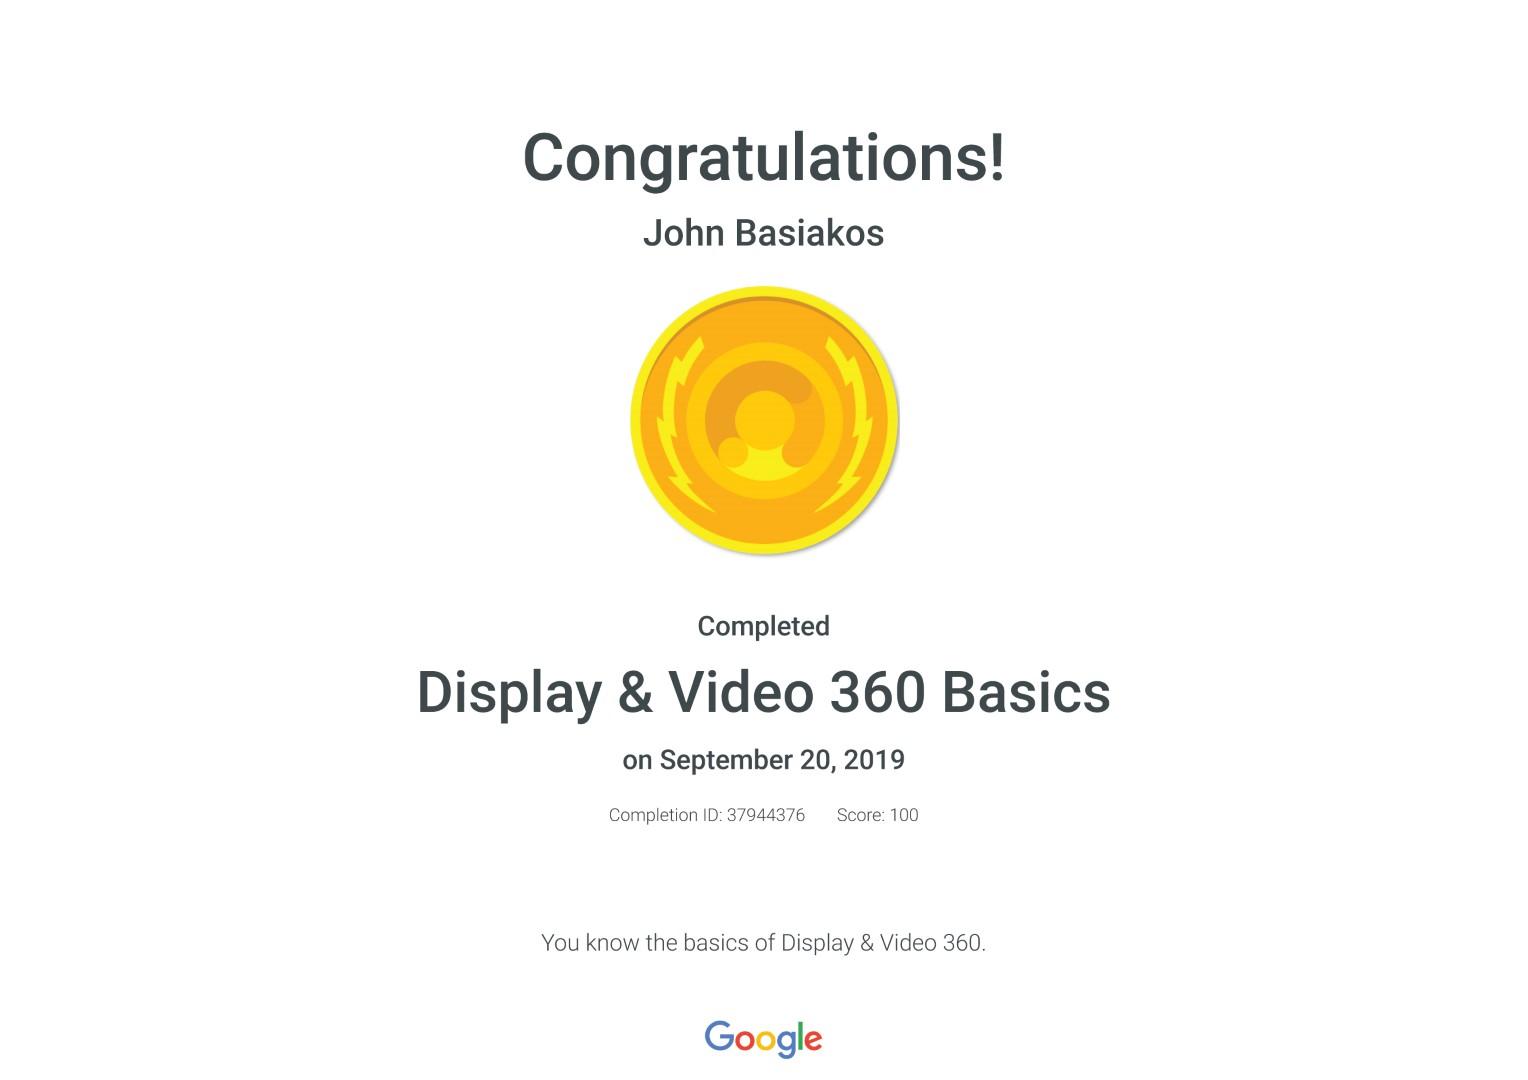 Display & Video 360 Basics _ Google